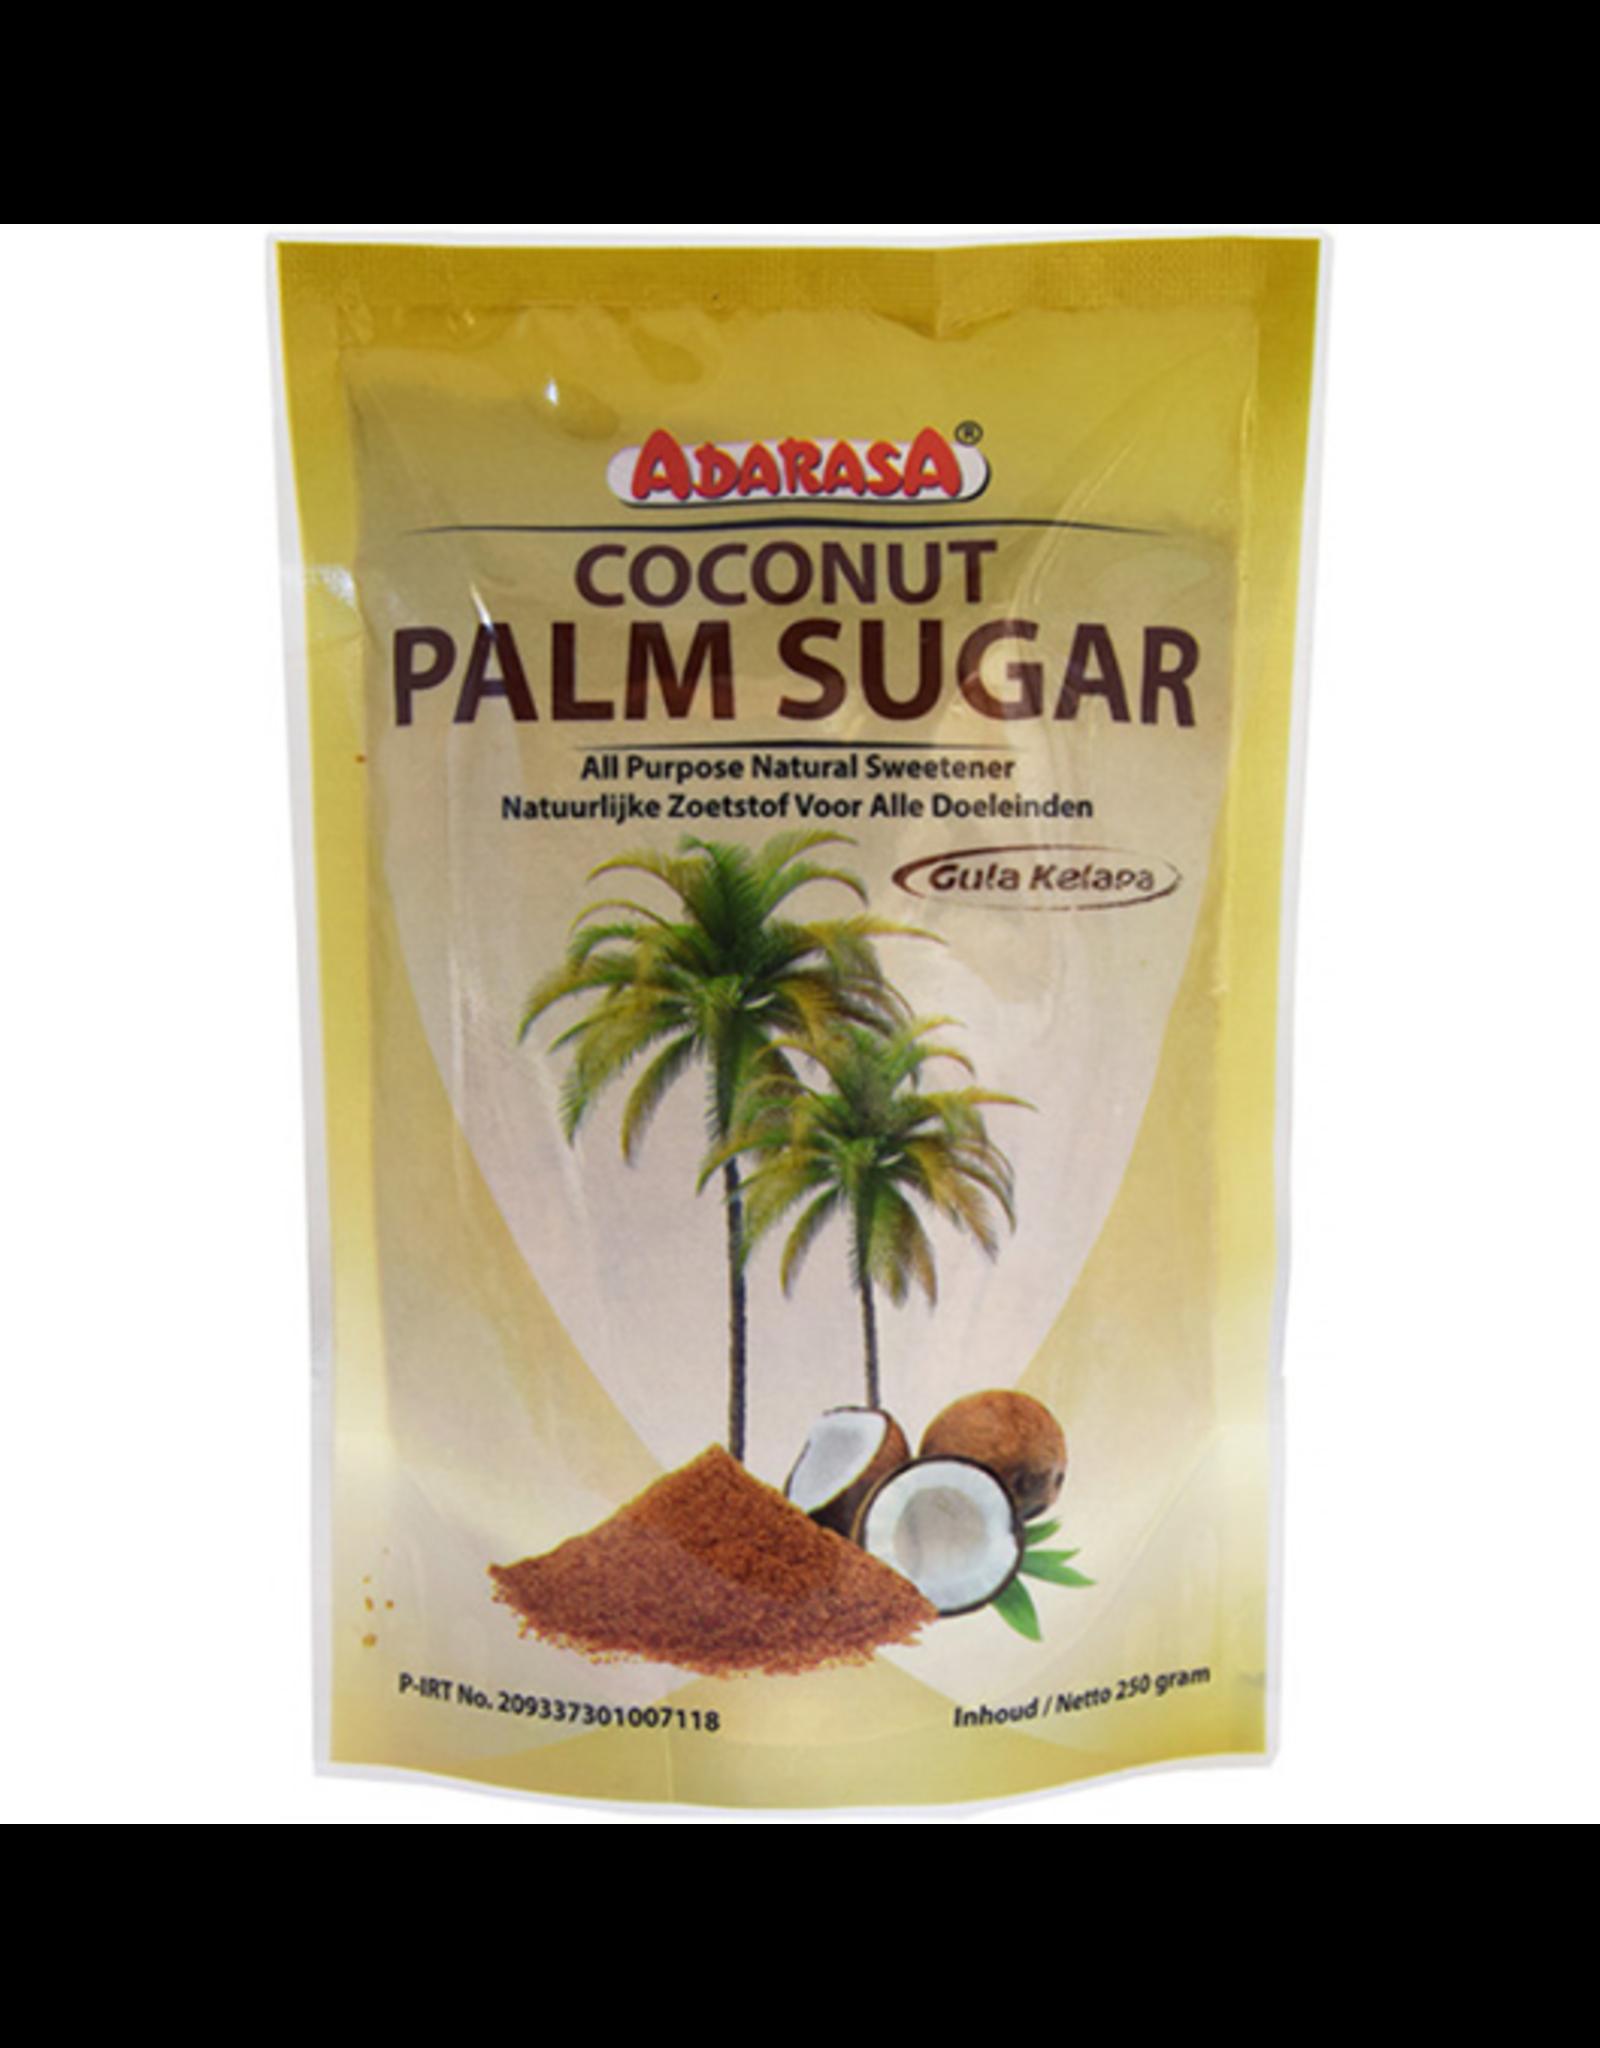 Adarasa Coconut Palm Sugar